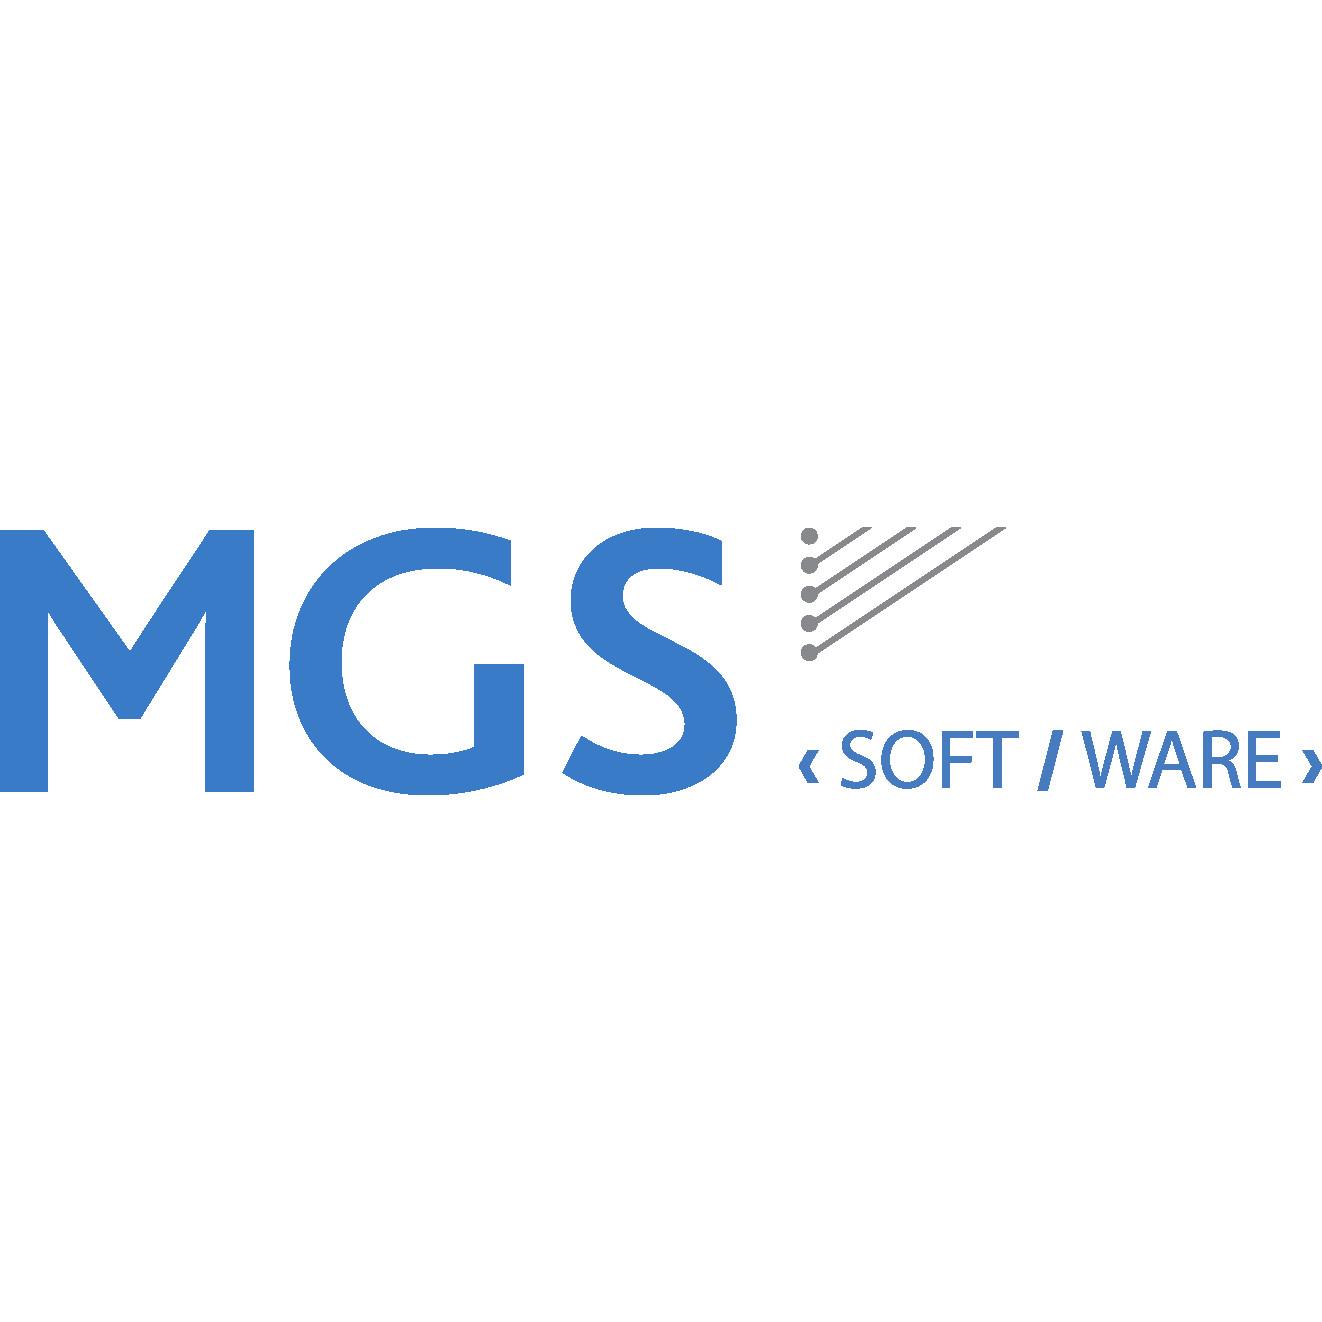 MGSsoftware